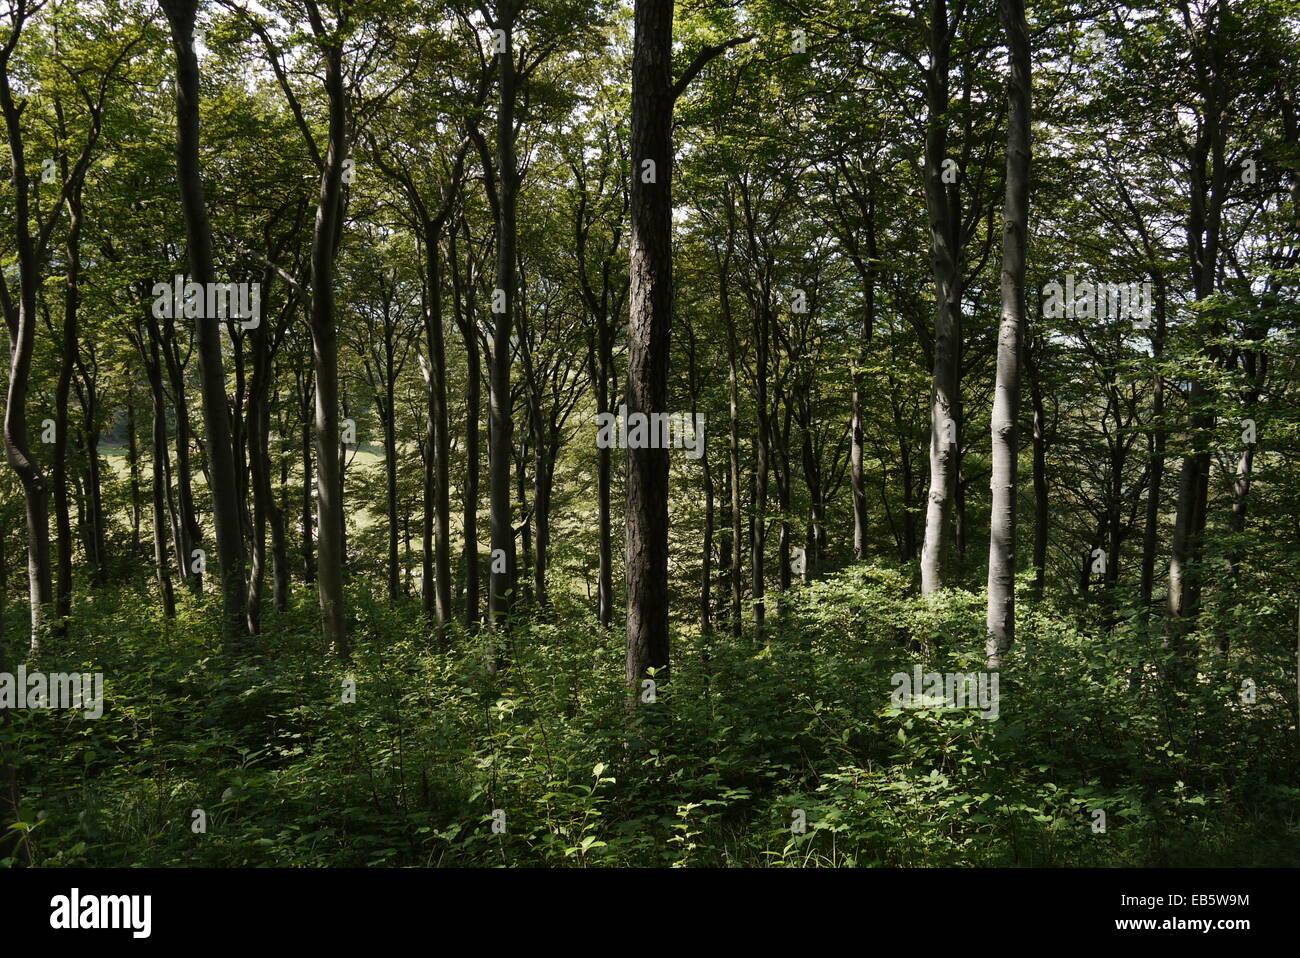 Beautiful forest in atmospheric light - Klassische, atmosphärische Wald-Szenerie in den Schweizer Jurabergen Stock Photo